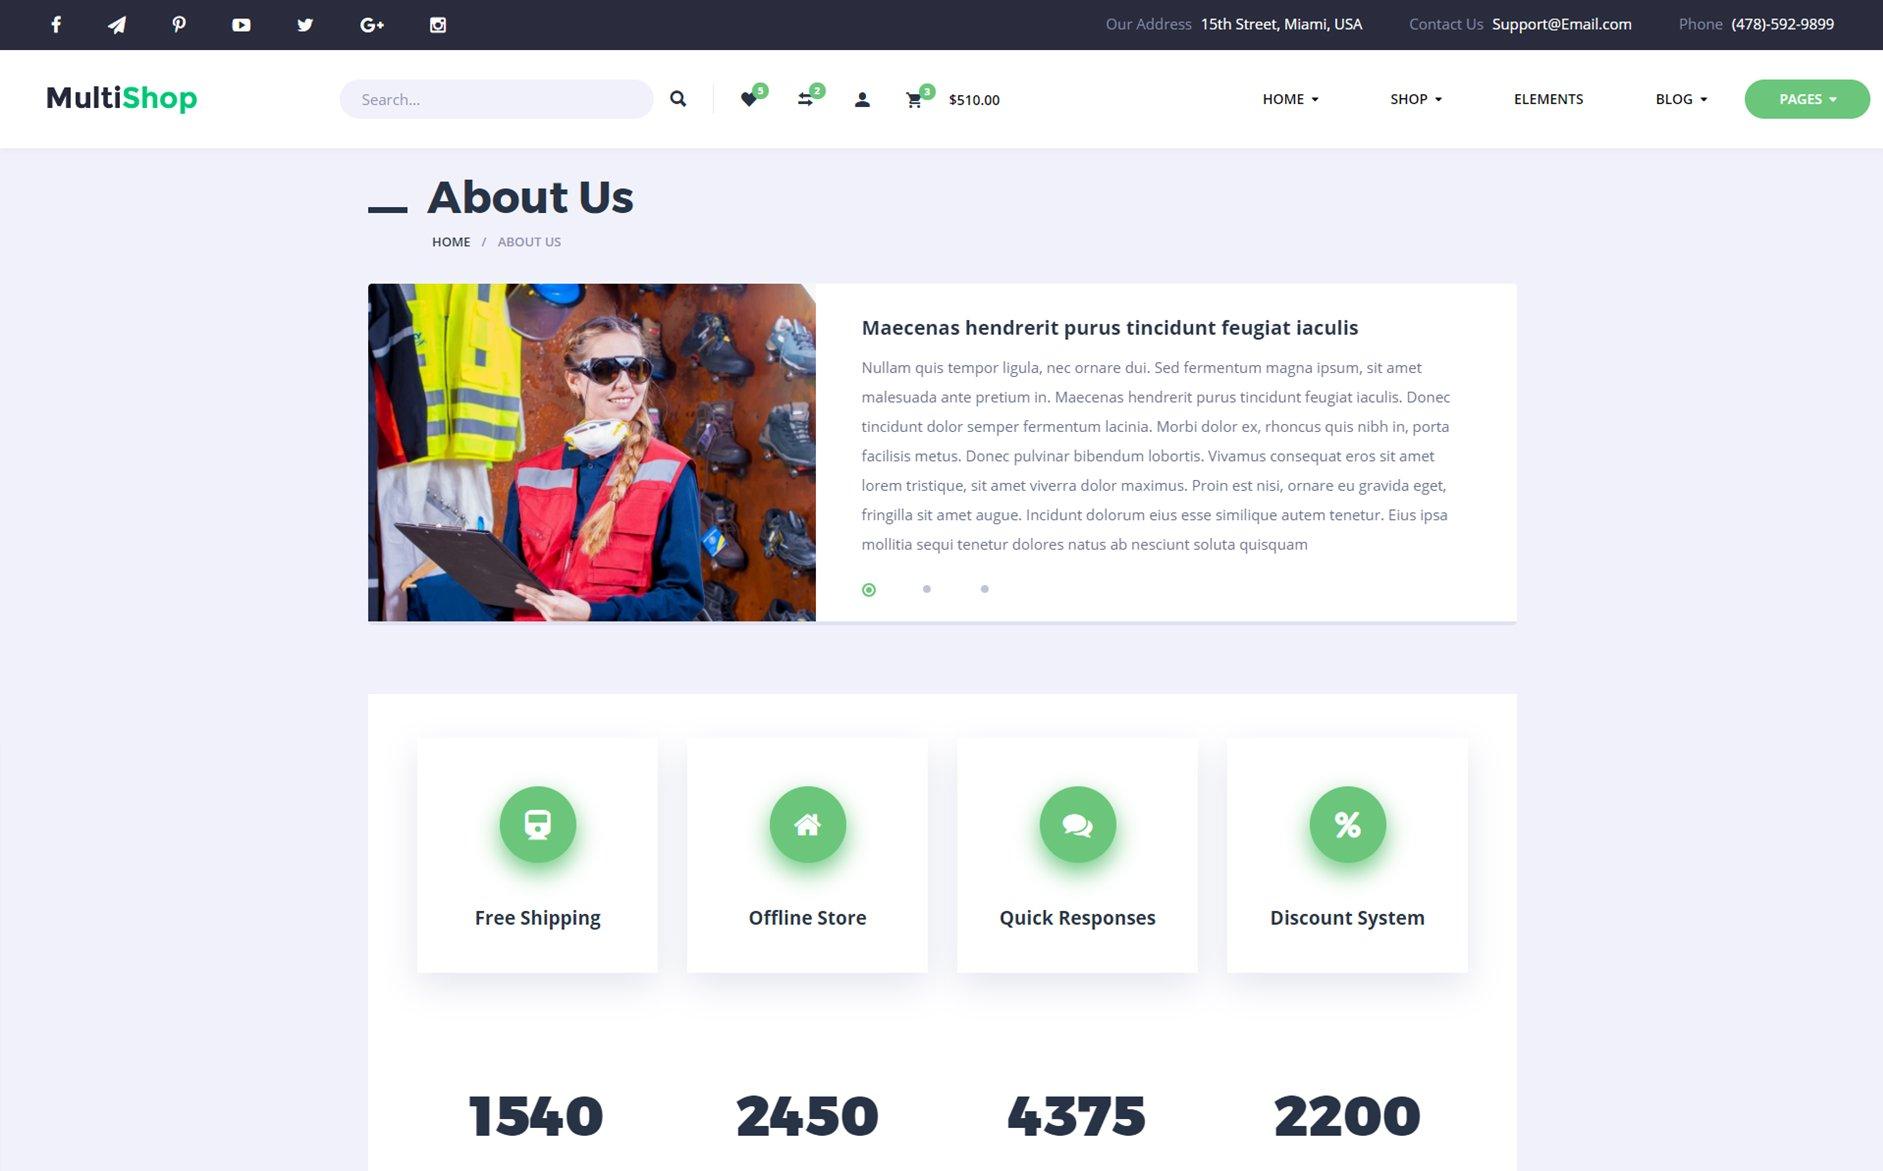 Multishop - Responsive eCommerce HTML Website Template